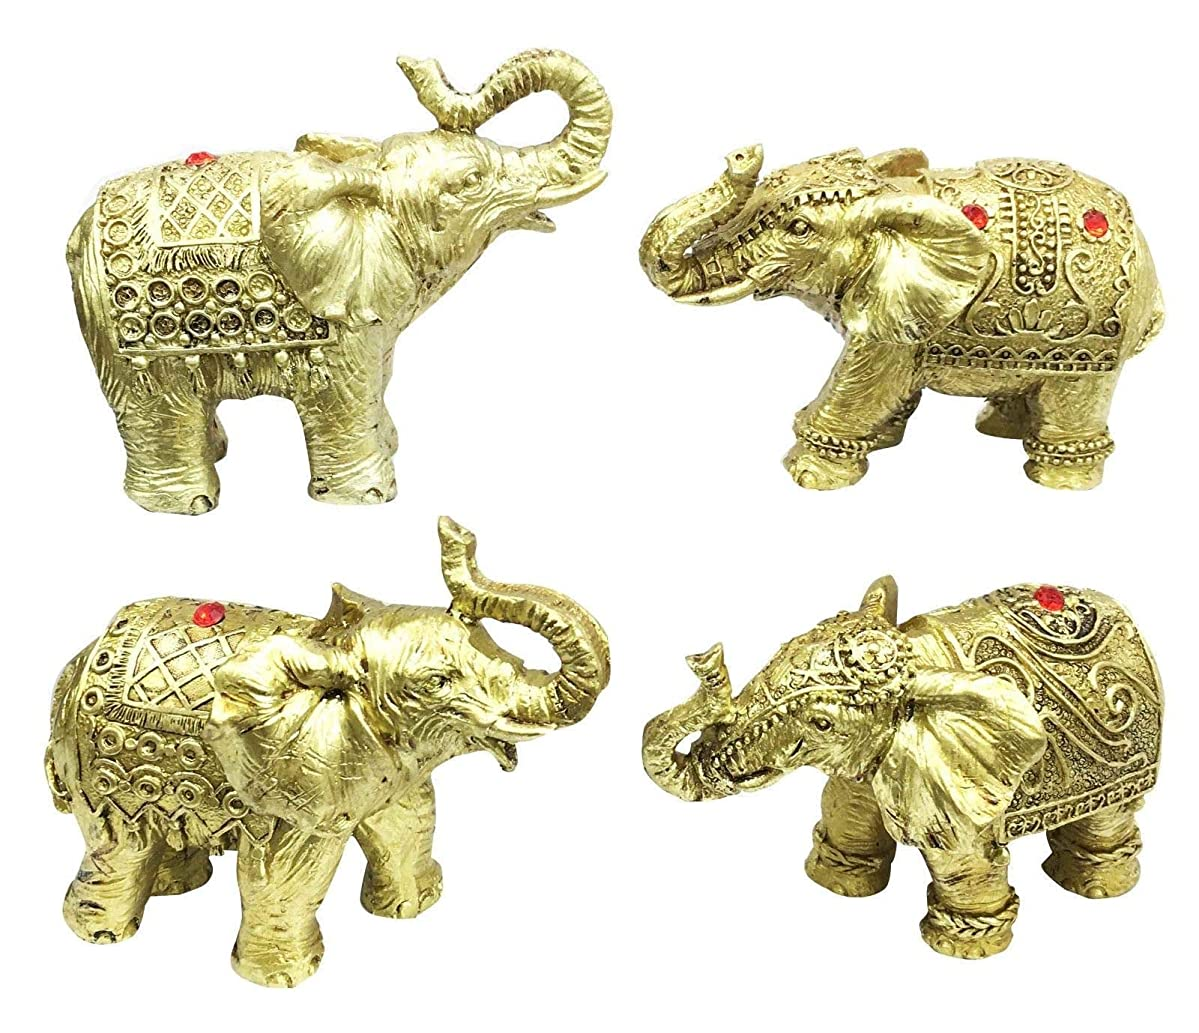 Figurine Thai Buddha Ganesh Elephant with Trunk Up Set of Four Pcs Miniature